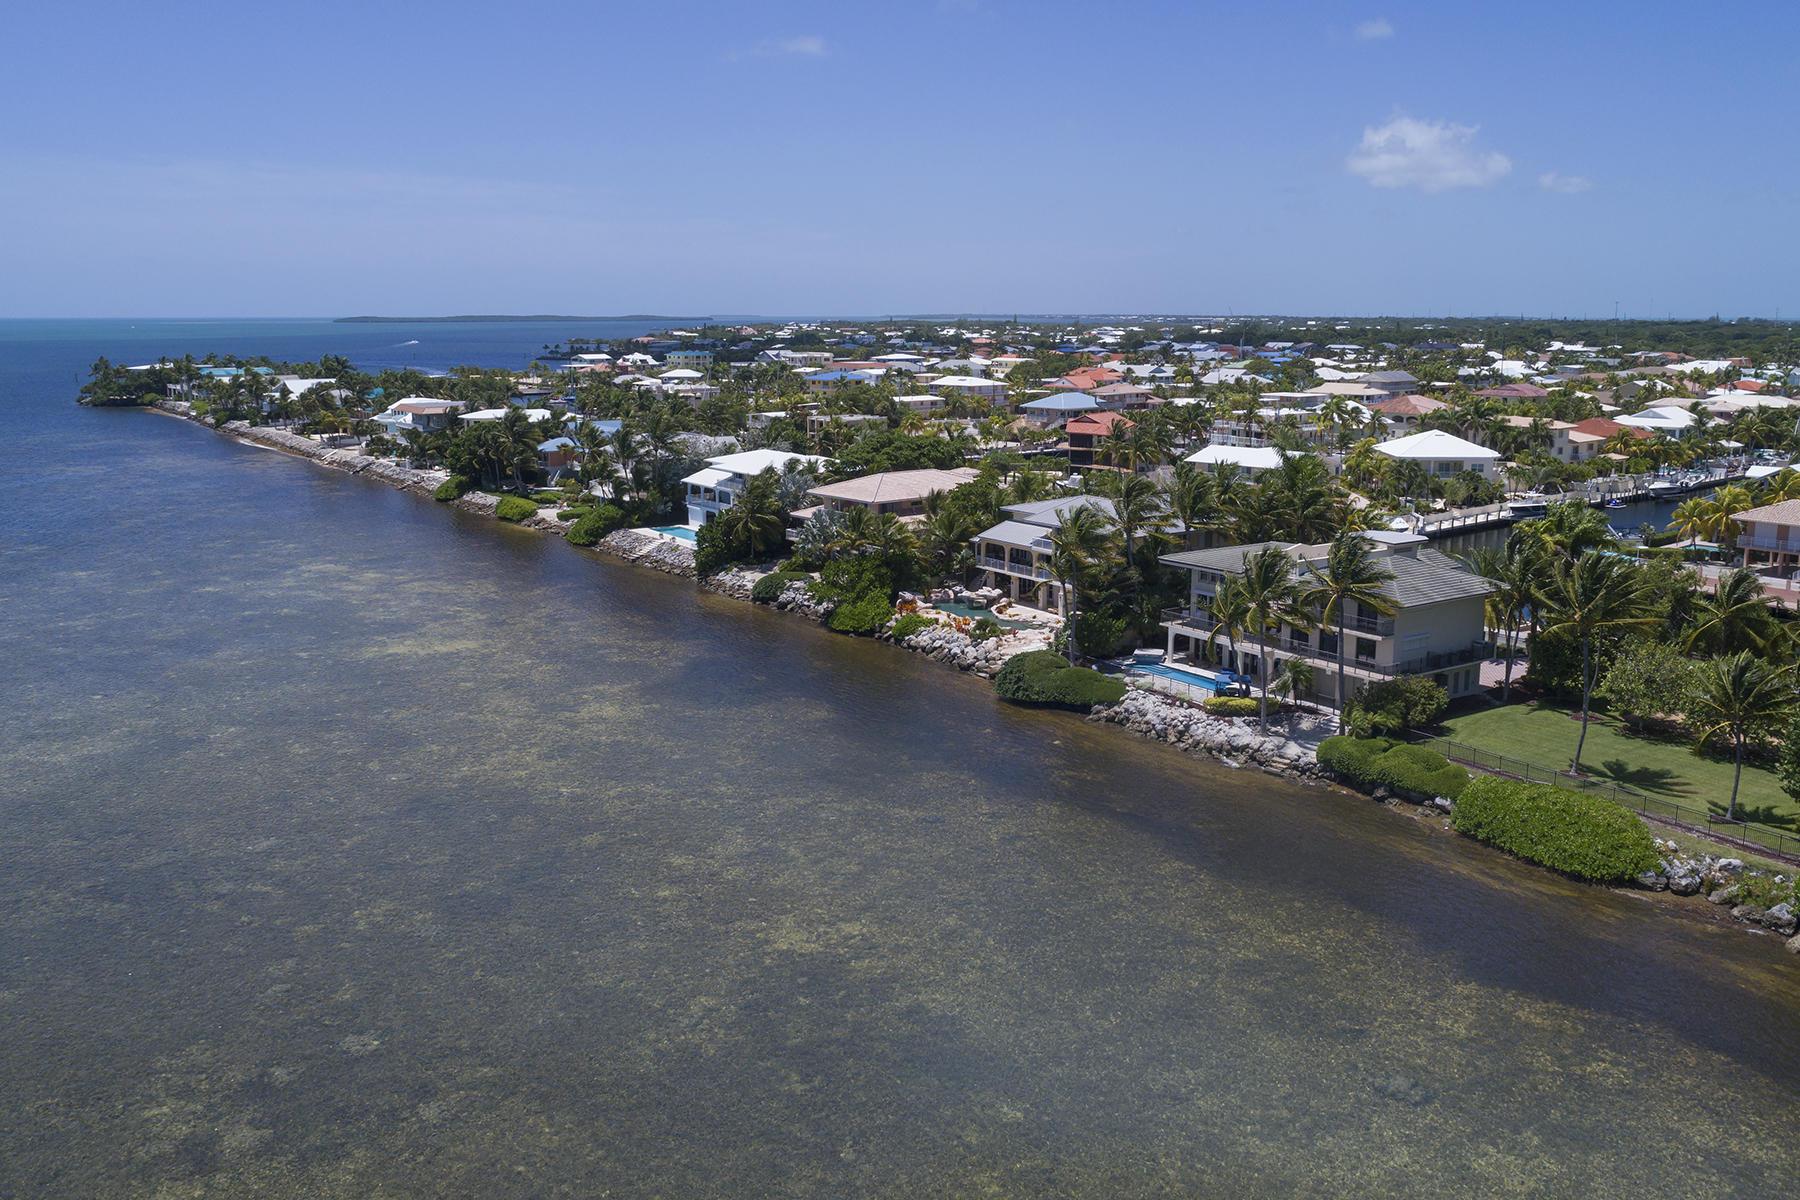 543-544 Ocean Cay